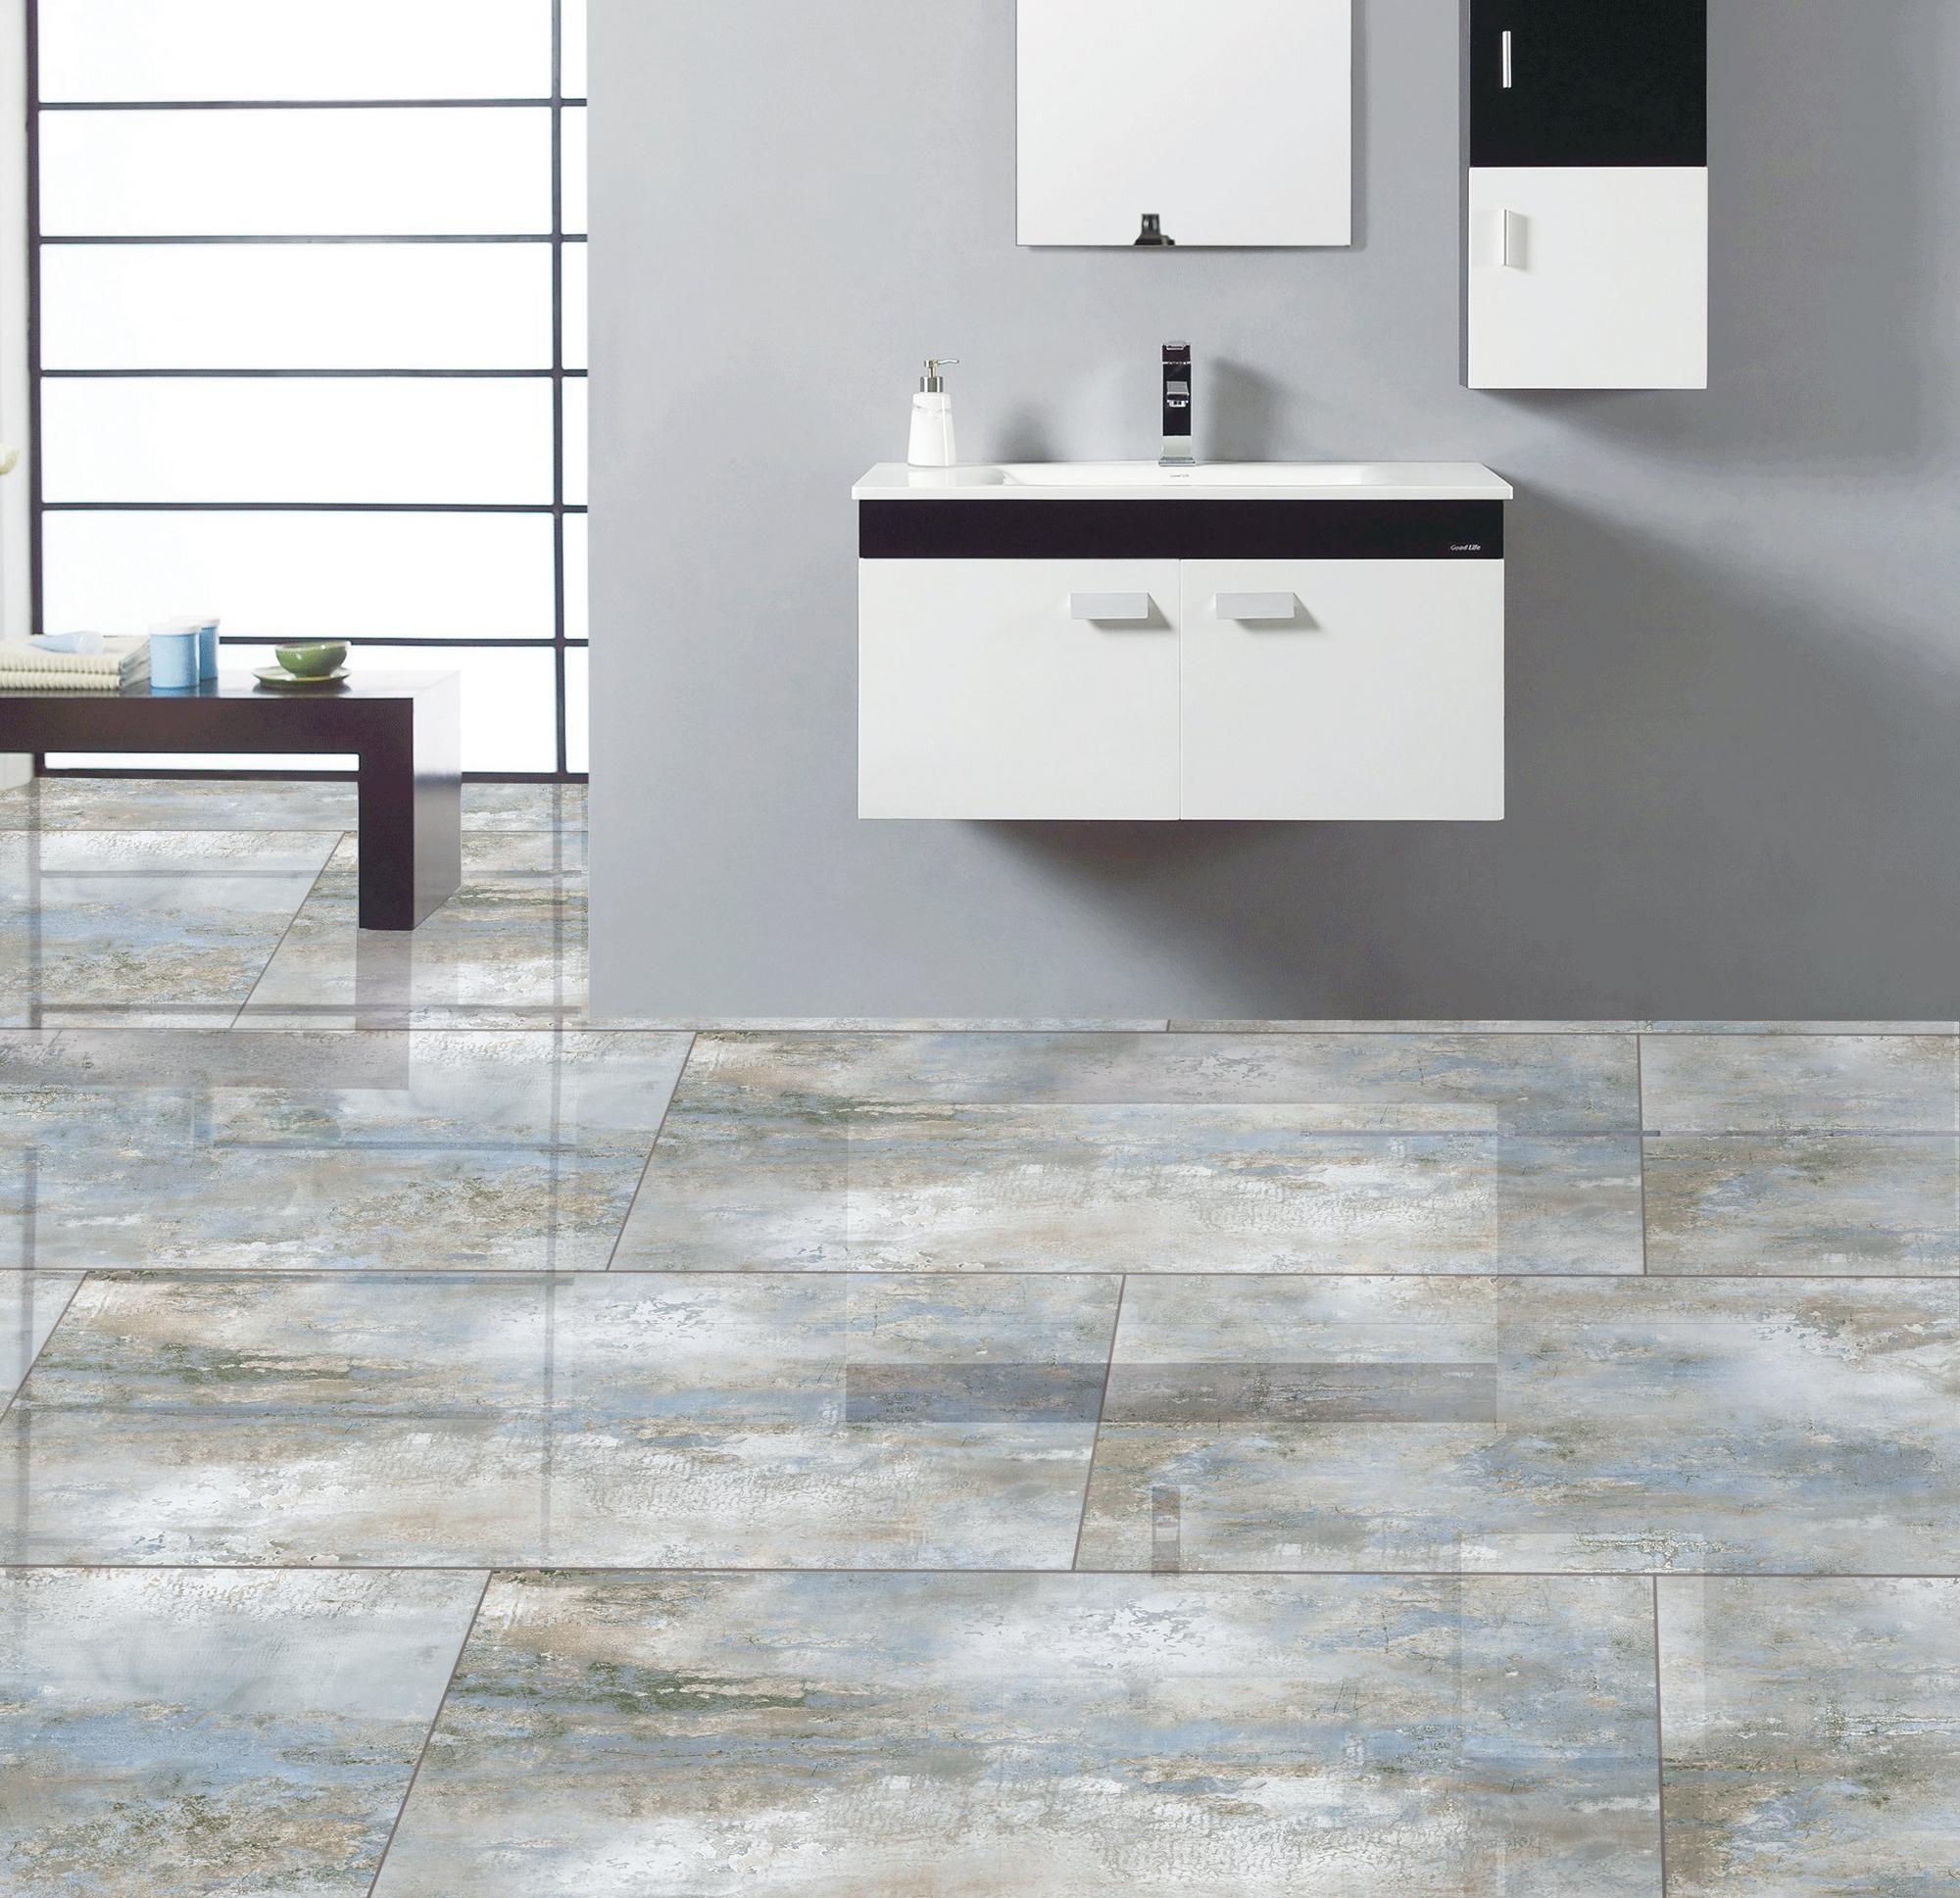 Tranquility Blue Polished Tile Floor Decor Guest Bathroom Small Floor Decor Flooring